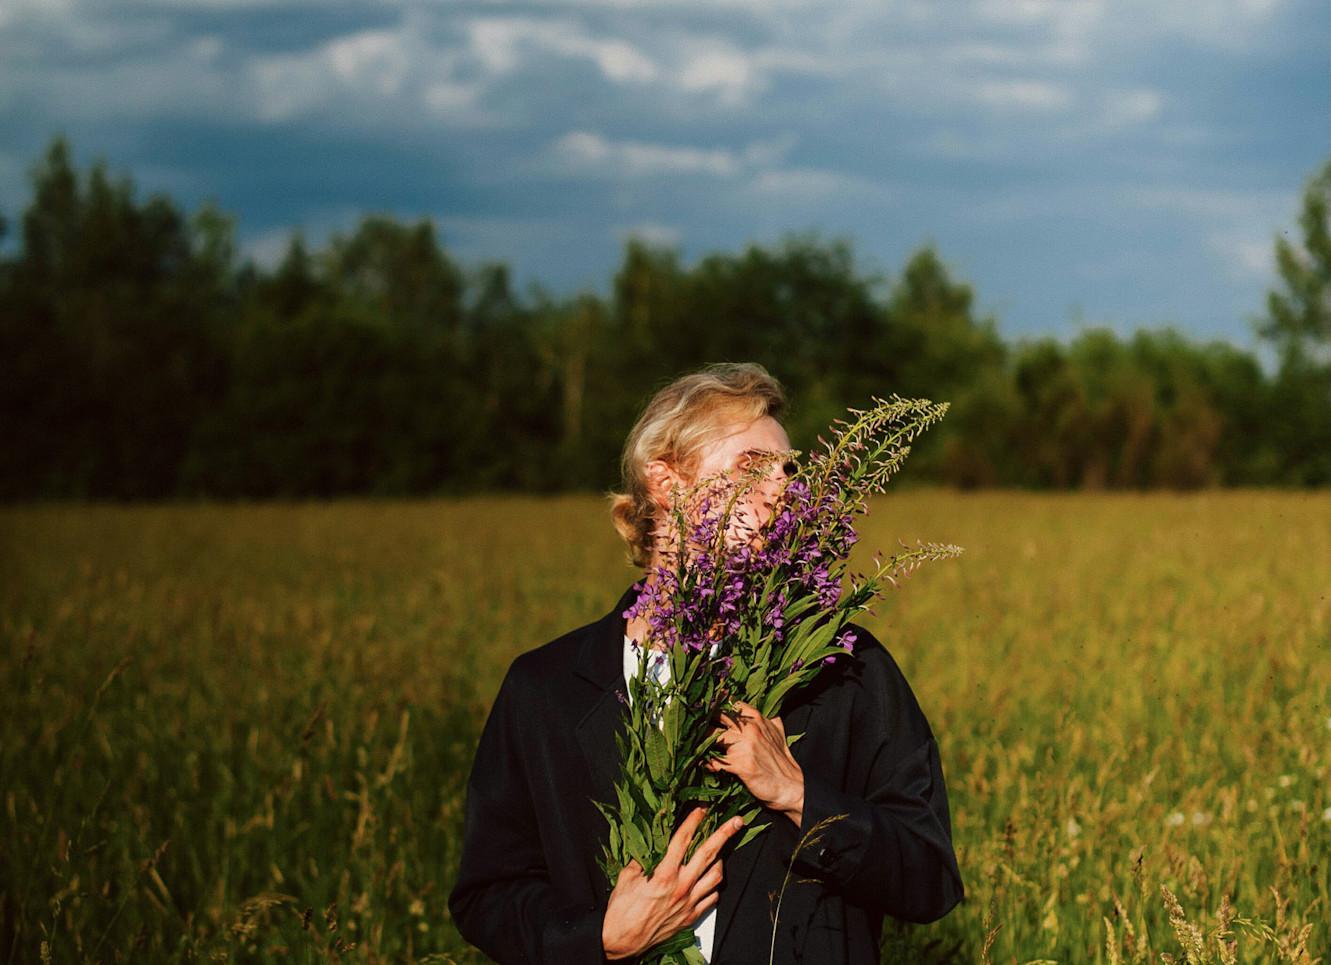 Sergey Vinogradov